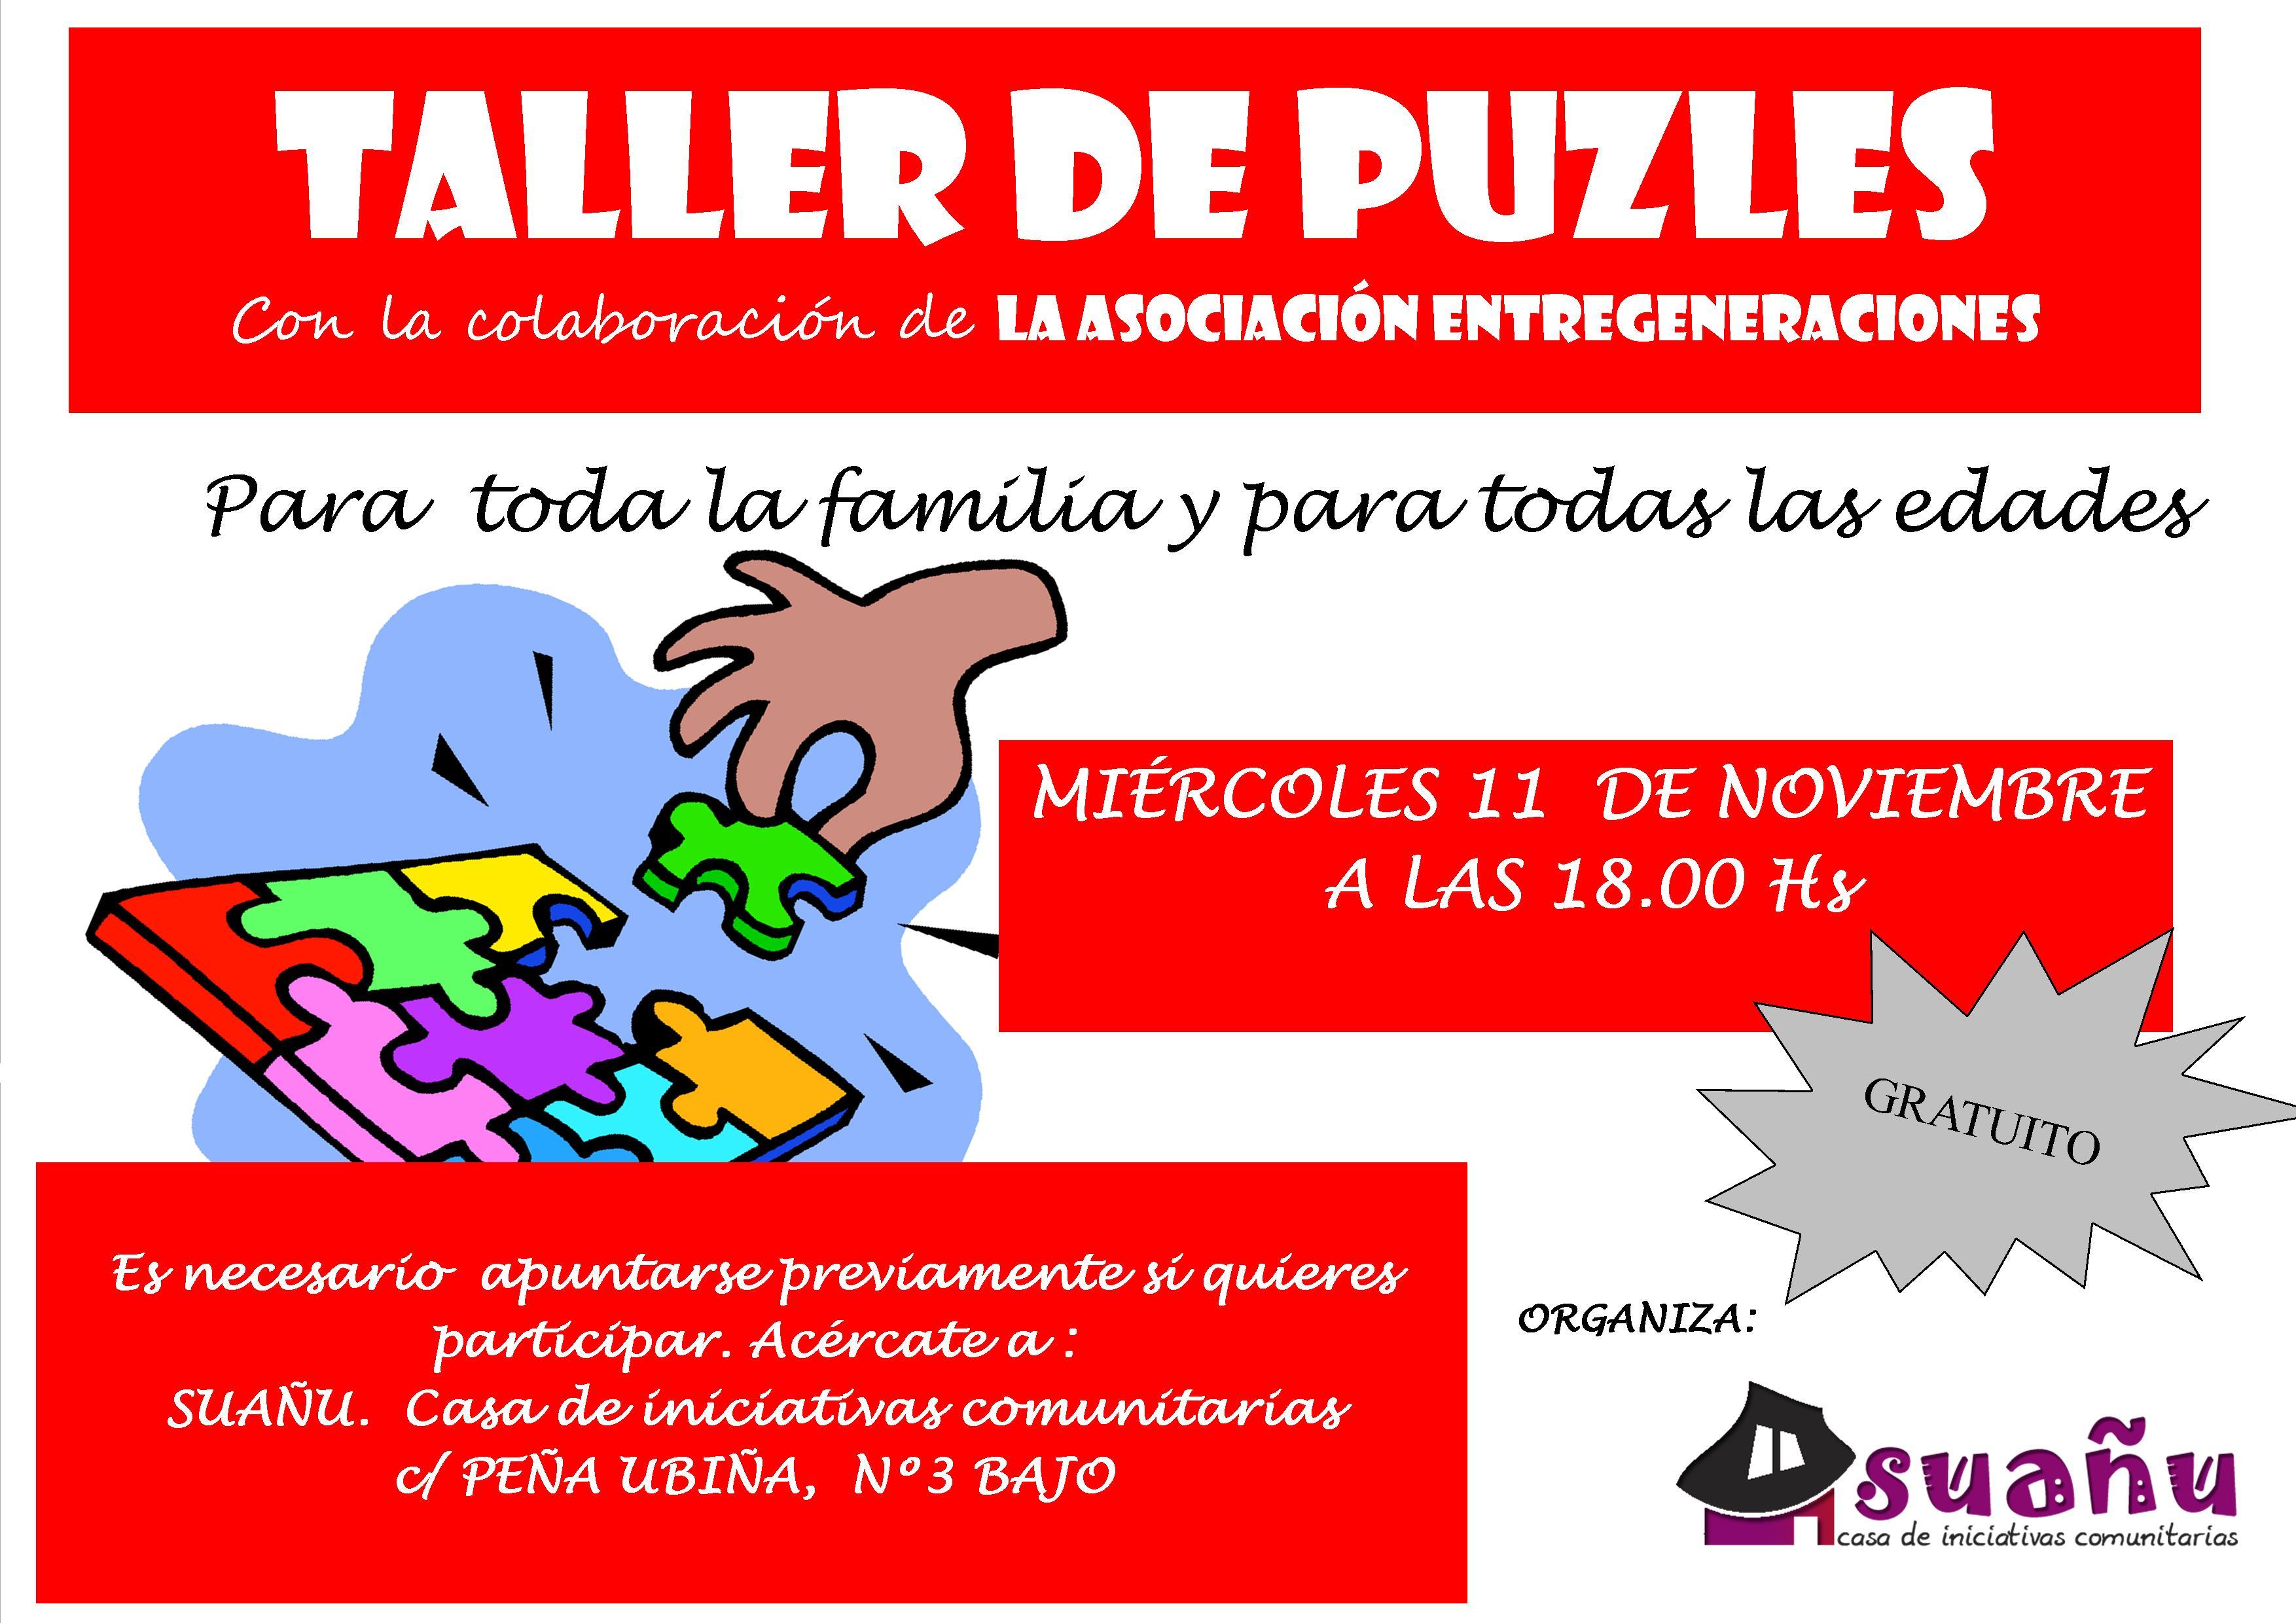 cartel taller de puzzles